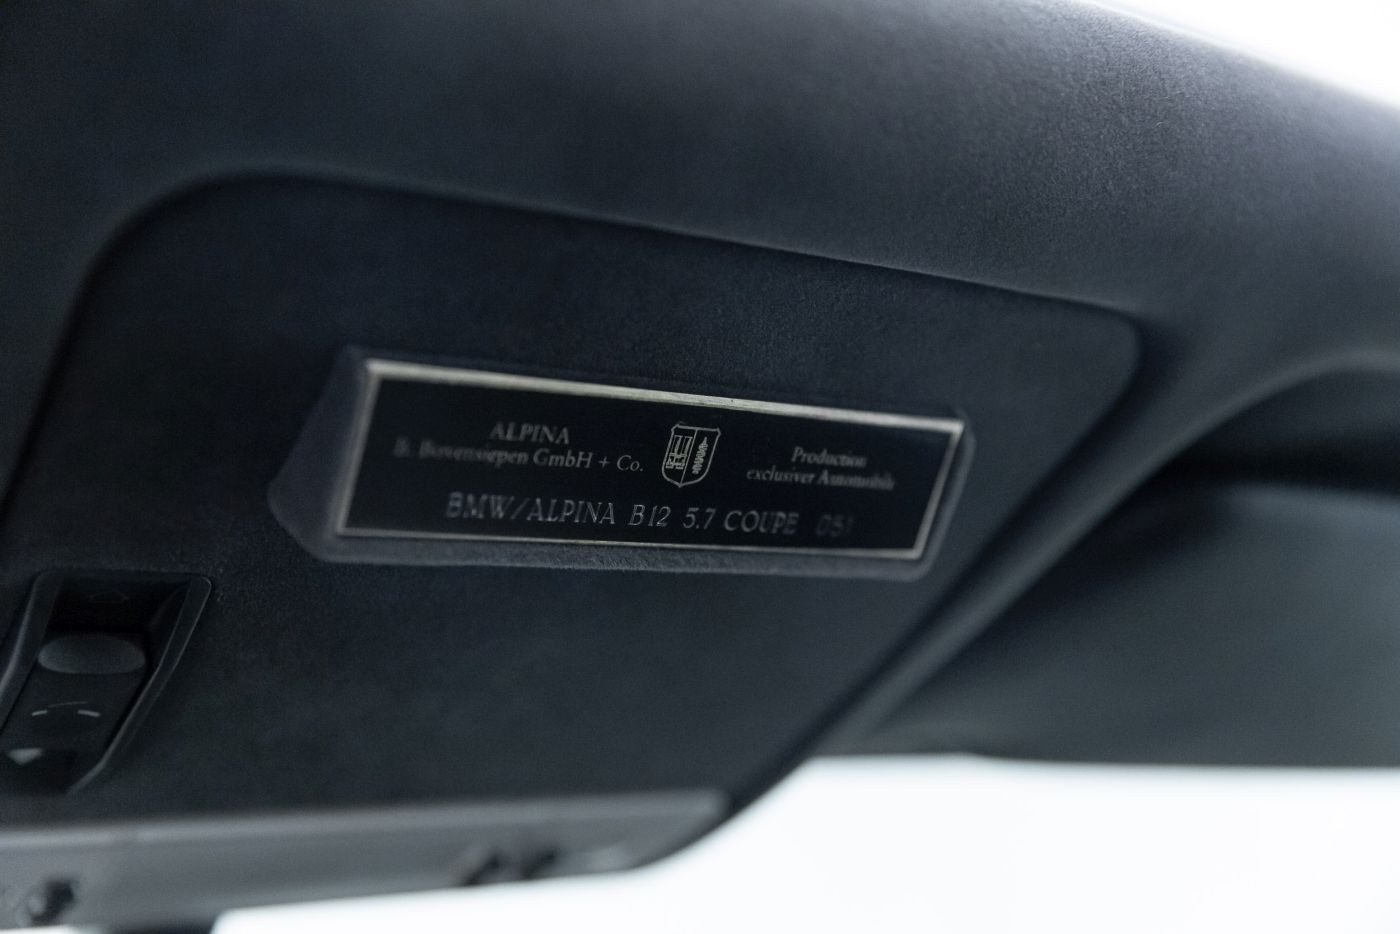 Alpina BMW Plakette